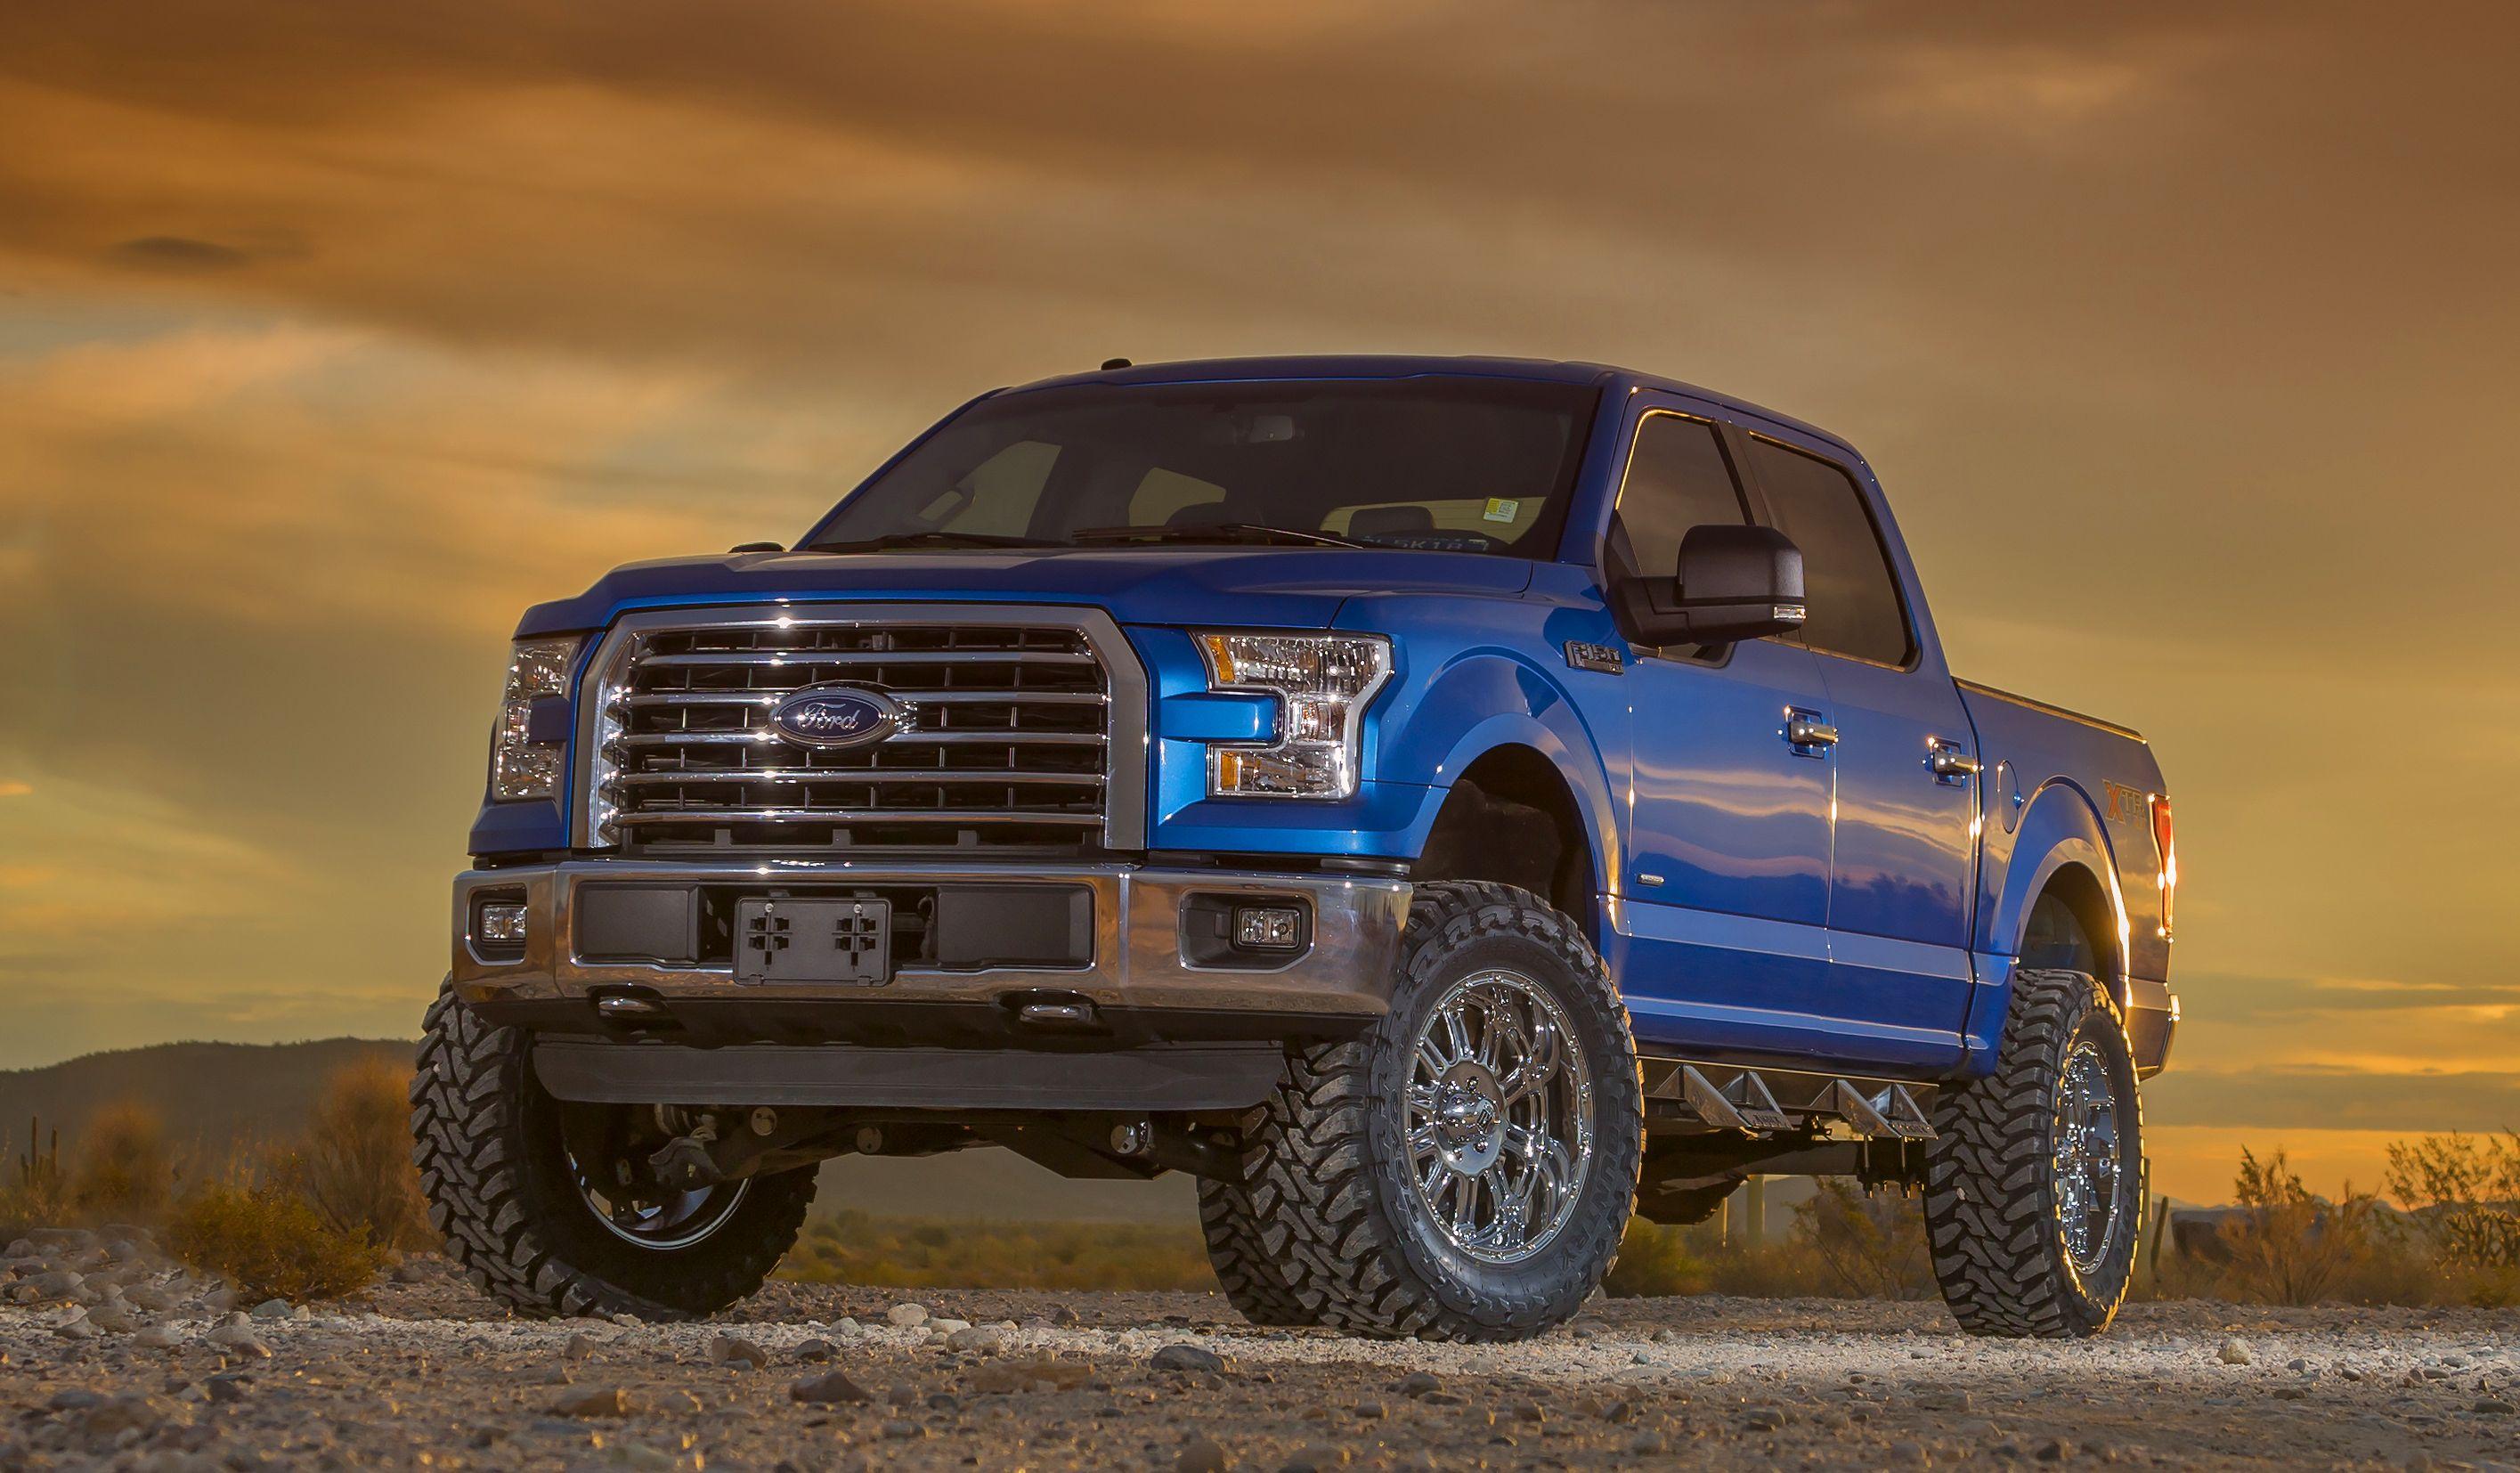 Lifted Trucks Built Ford F 150 4x4 Http Www Liftedtrucks Com